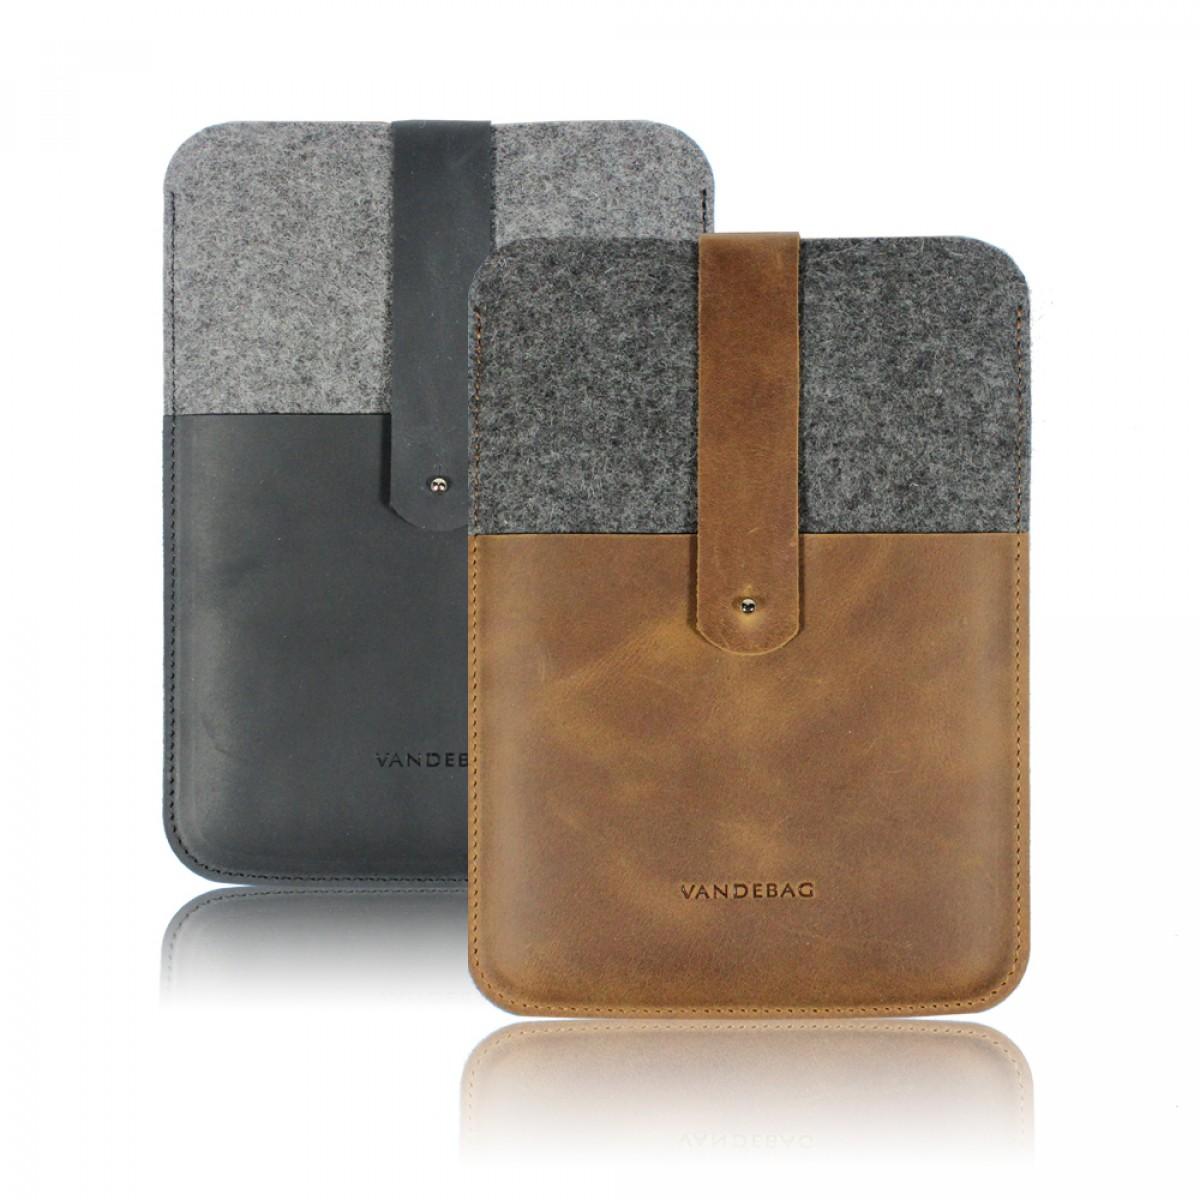 VANDEBAG - iPad mini Case aus Merino Wollfilz und Leder